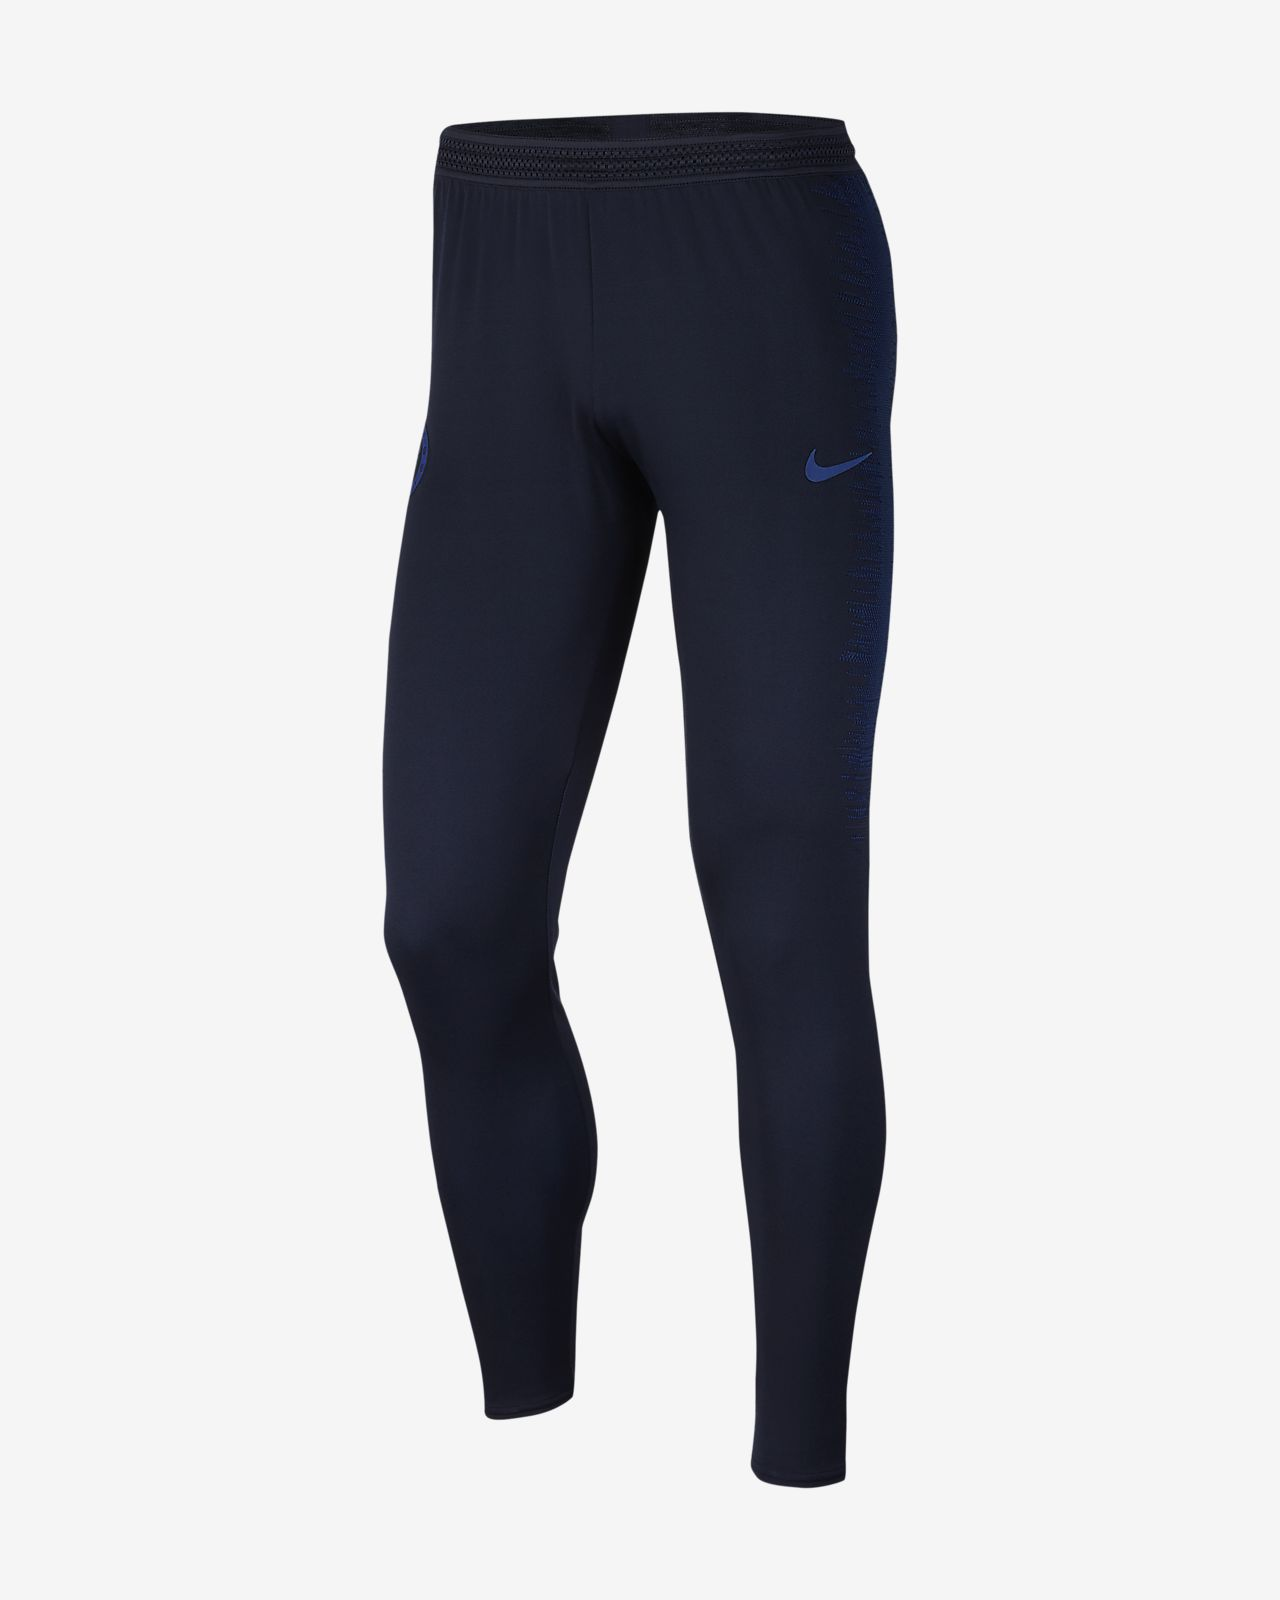 Pantalones de fútbol para hombre Chelsea FC VaporKnit Strike